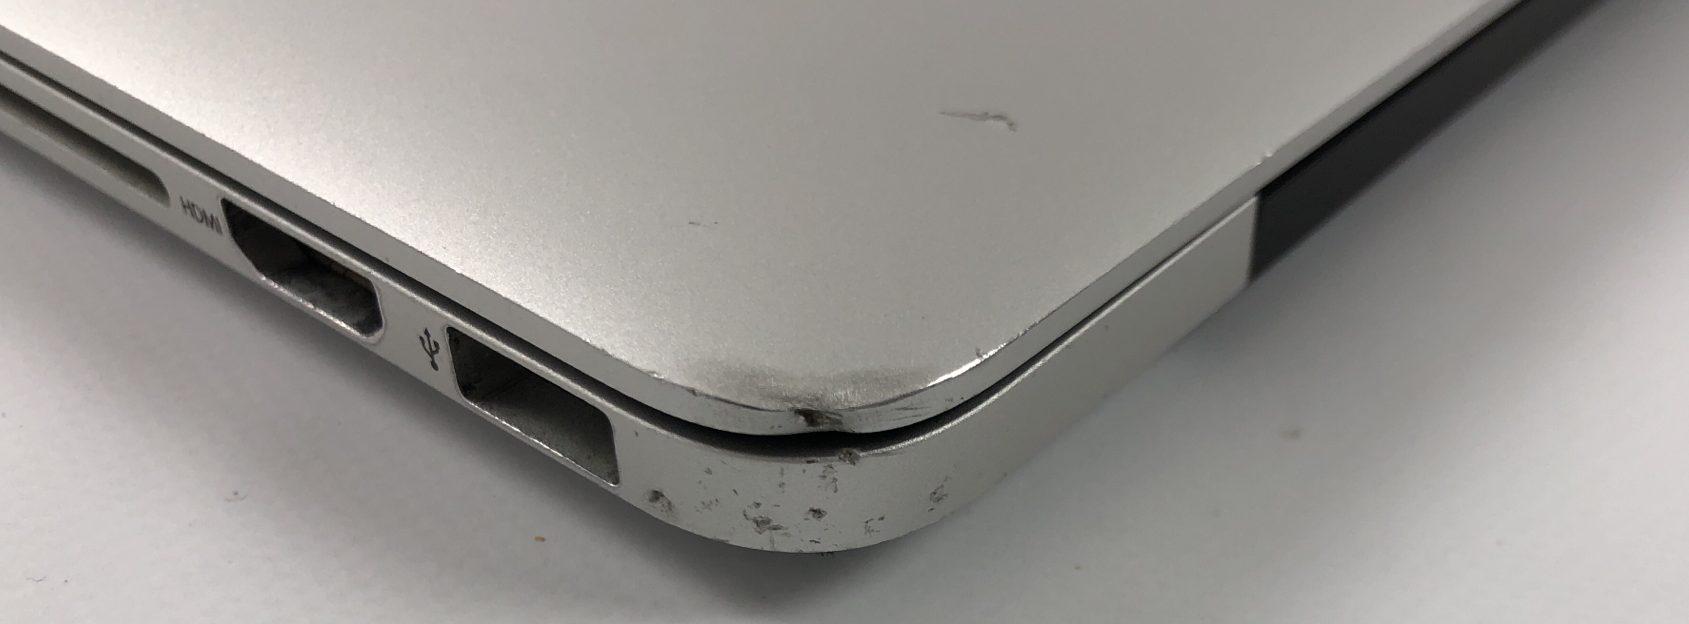 "MacBook Pro Retina 13"" Early 2015 (Intel Core i5 2.7 GHz 8 GB RAM 128 GB SSD), Intel Core i5 2.7 GHz, 8 GB RAM, 128 GB SSD, Kuva 4"